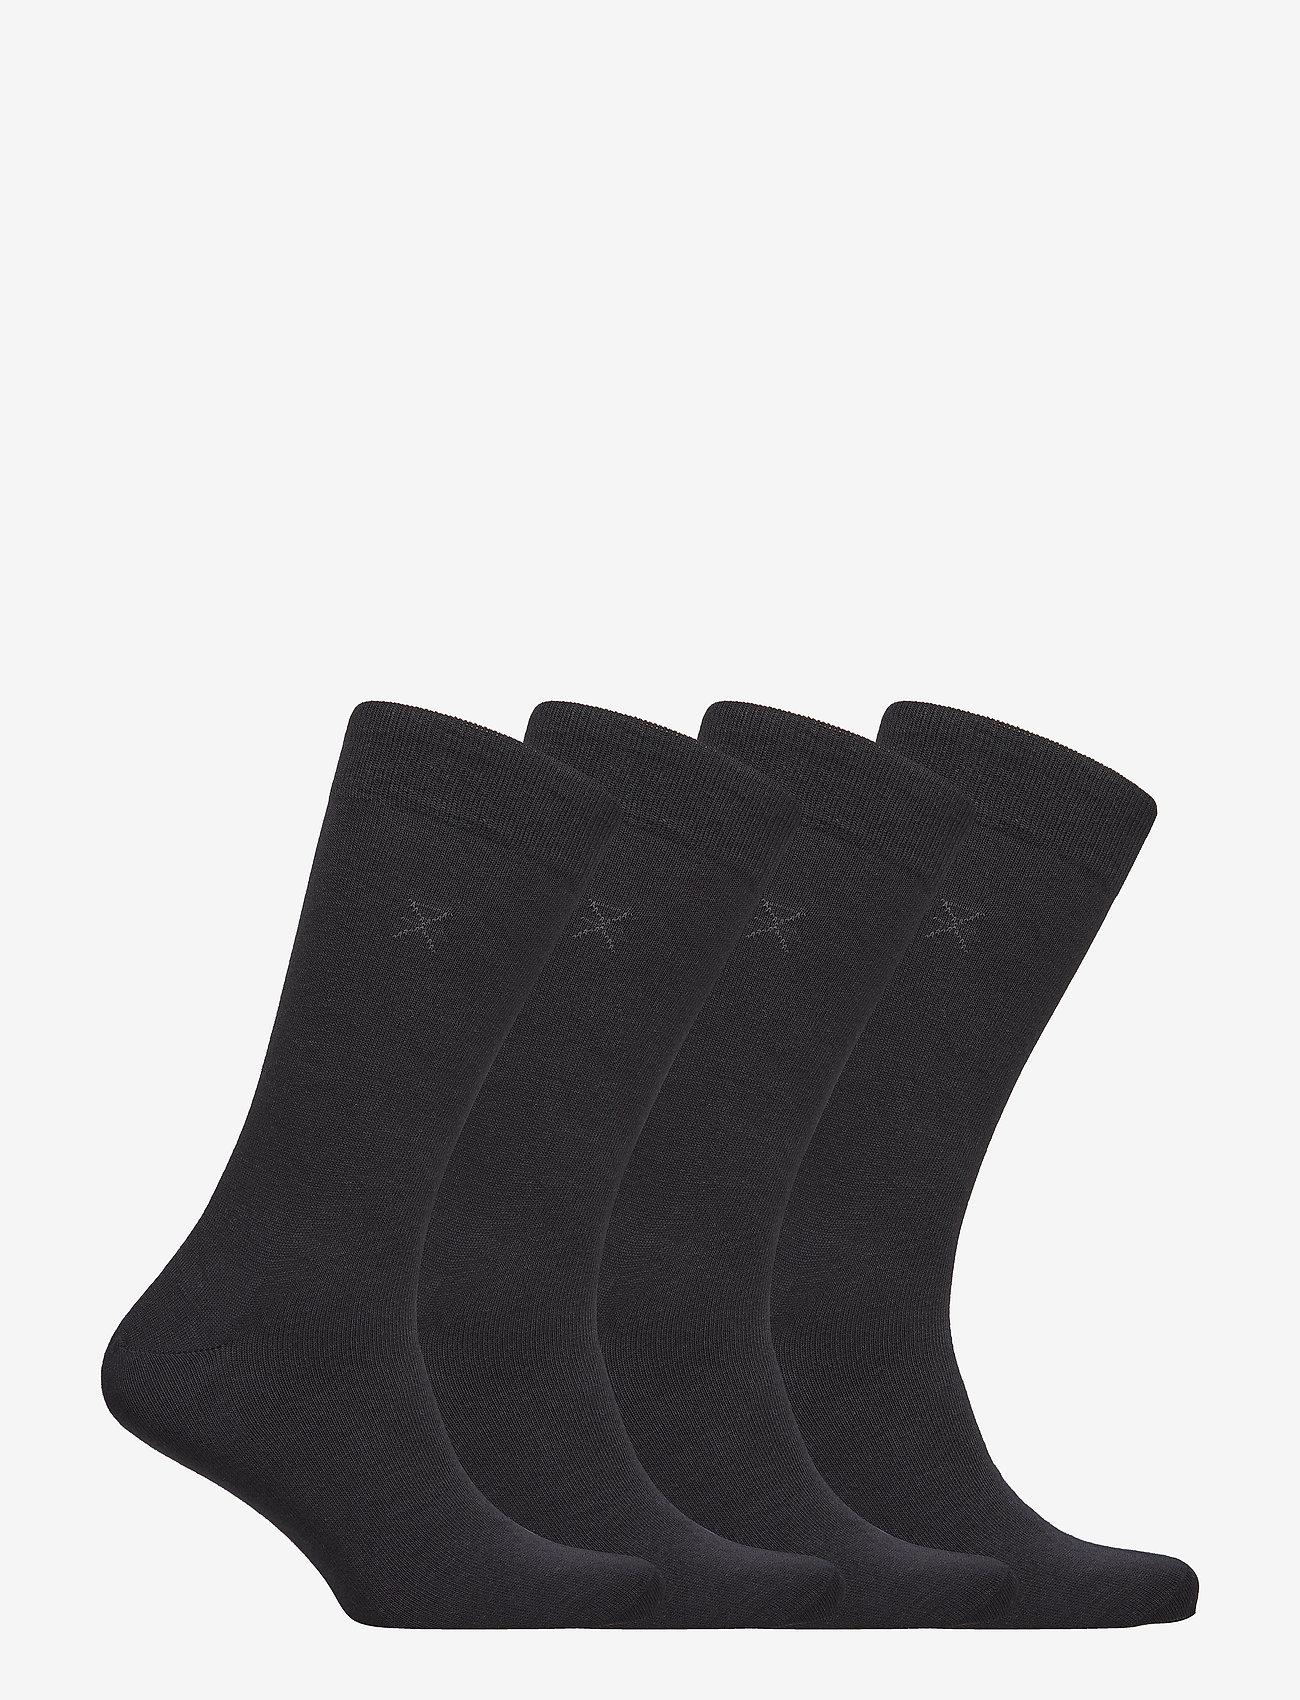 JBS of Denmark - JBS of dk socks cotton 4-pack - chaussettes régulières - black - 1